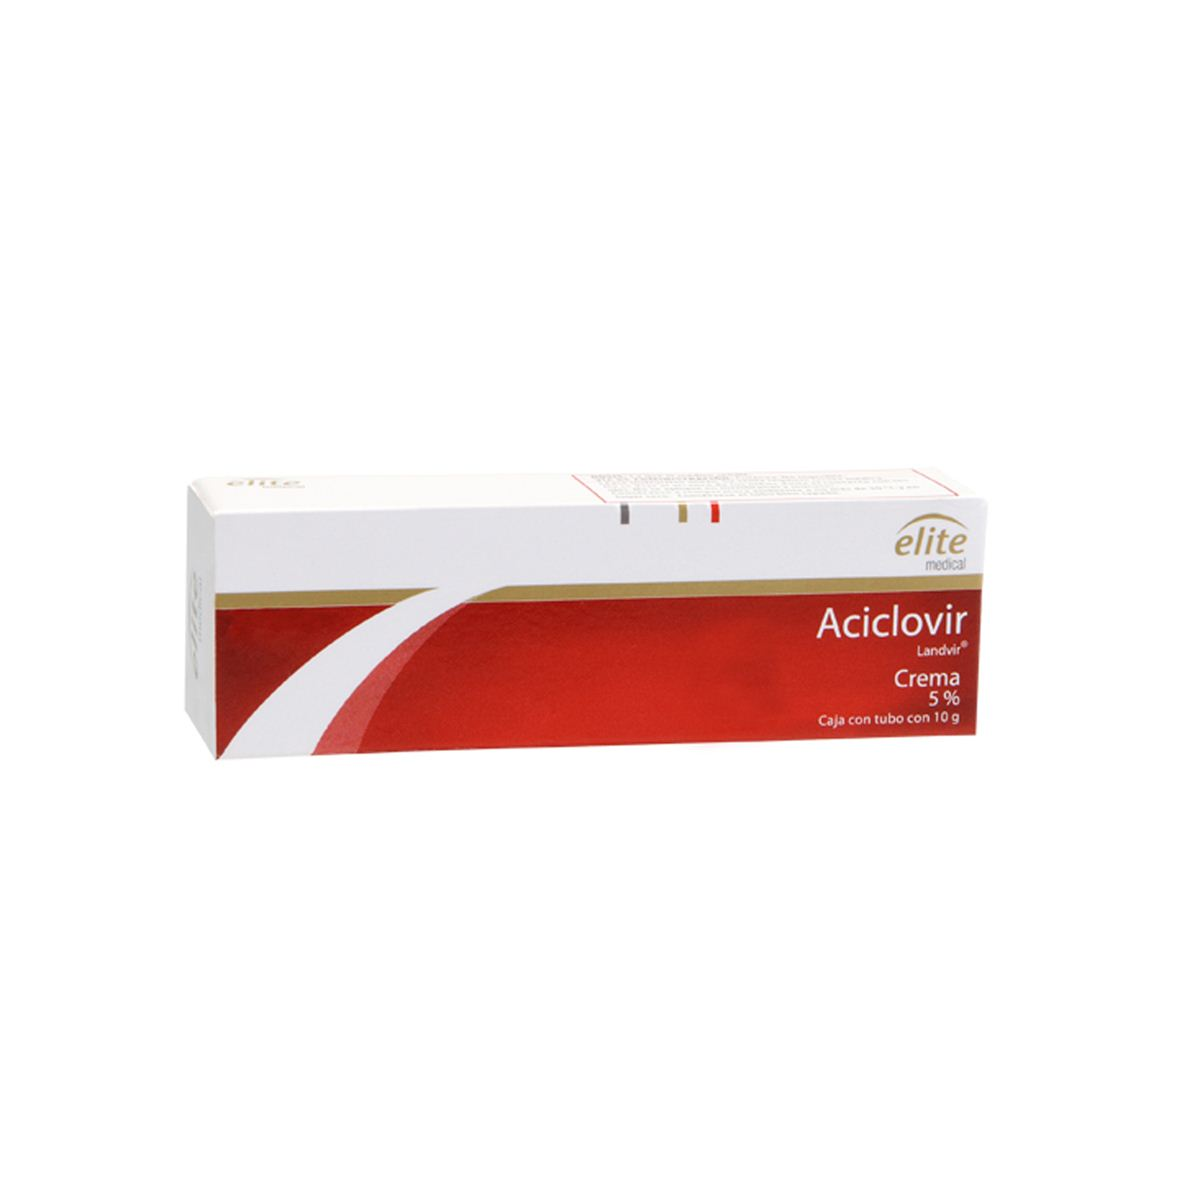 Comprar Aciclovir 5 % 1 Tubo Crema 10 Gr